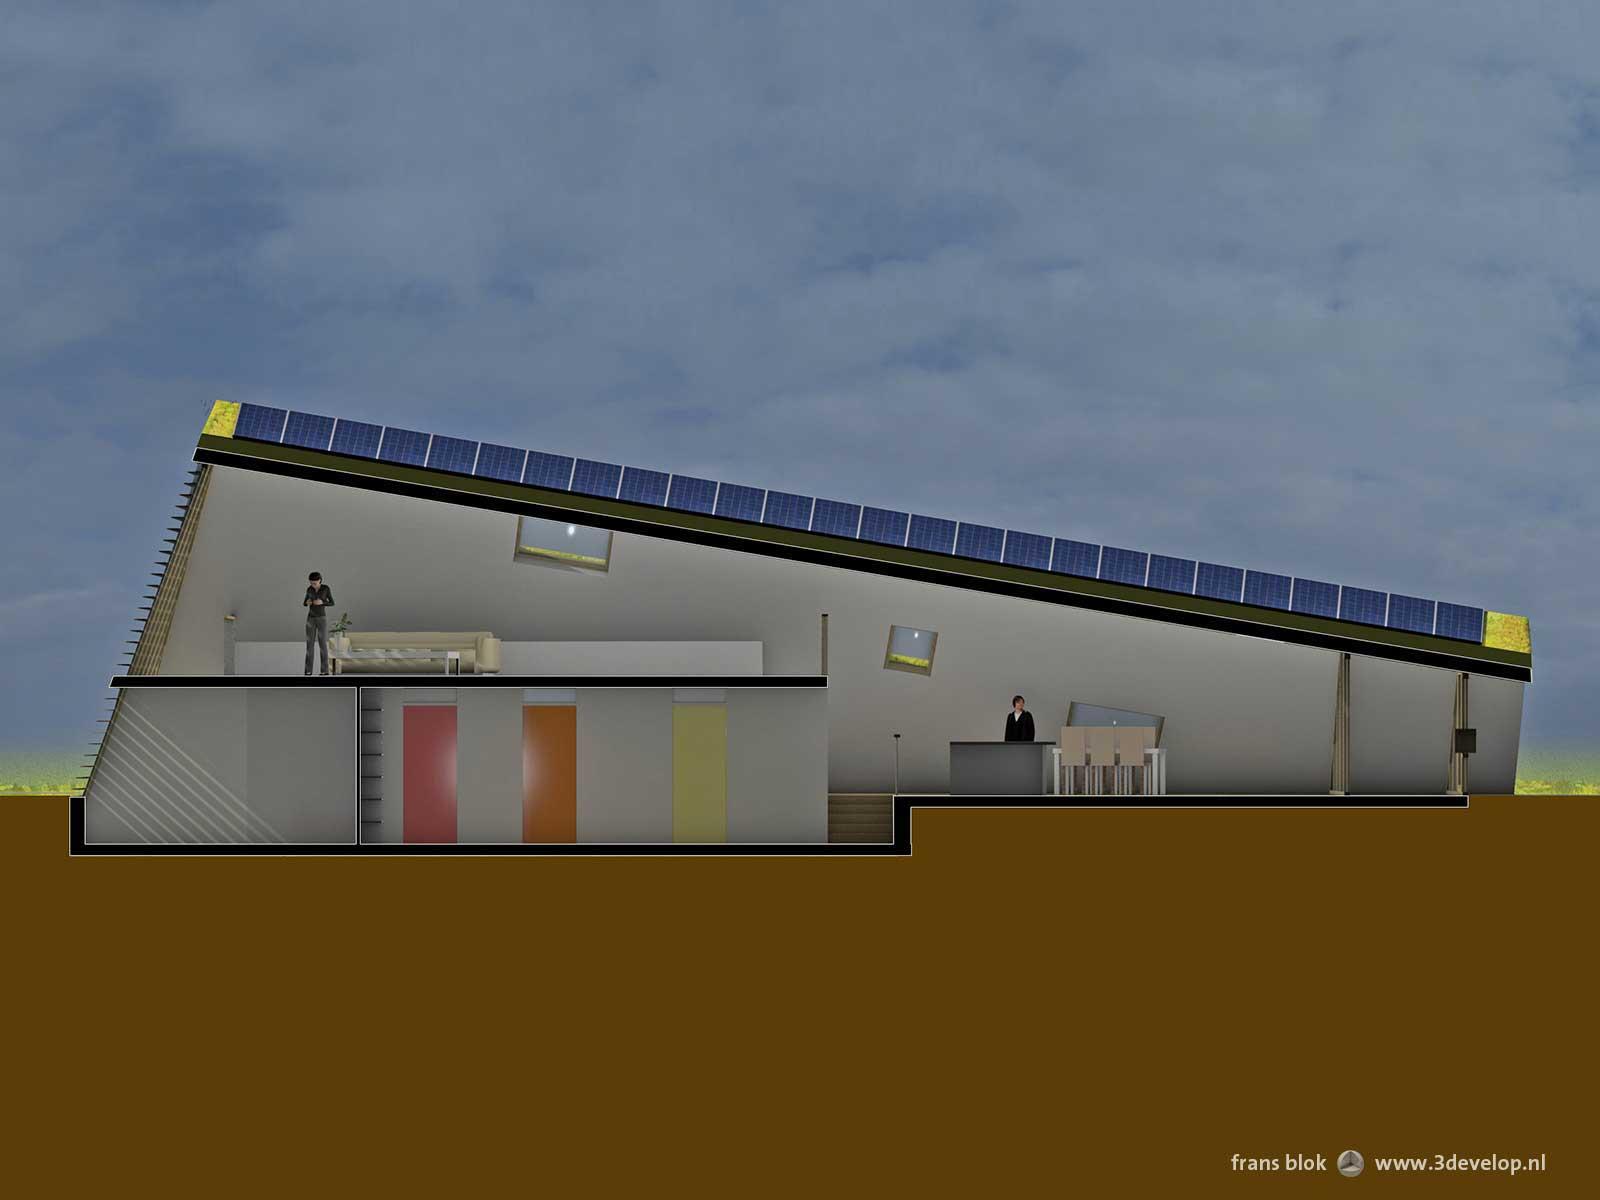 Langsdoorsnede van de Groene Piramide in Borne, een radicaal duurzame woning, met een halfondergrondse slaapverdieping en met keuken en woonkamer onder het hellende groene dak